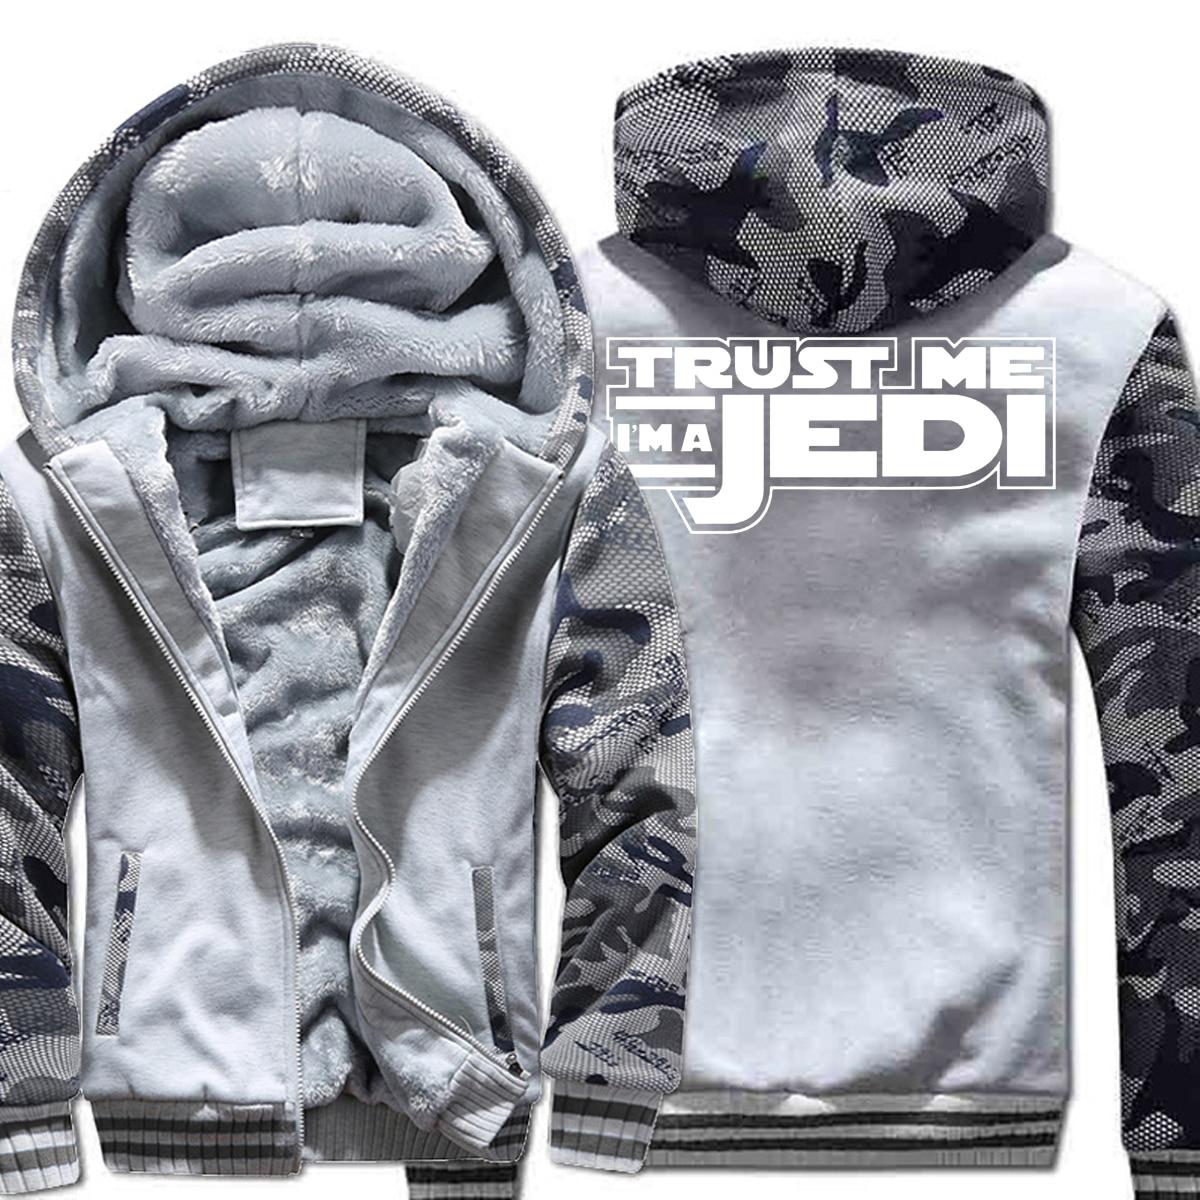 HAMPSON LANQE Star Wars I'm A Jedi Movie Jackets For Men 2019 Winter Warm Fleece Sweatshirts Hoodies Men Thicken Hooded M-5XL